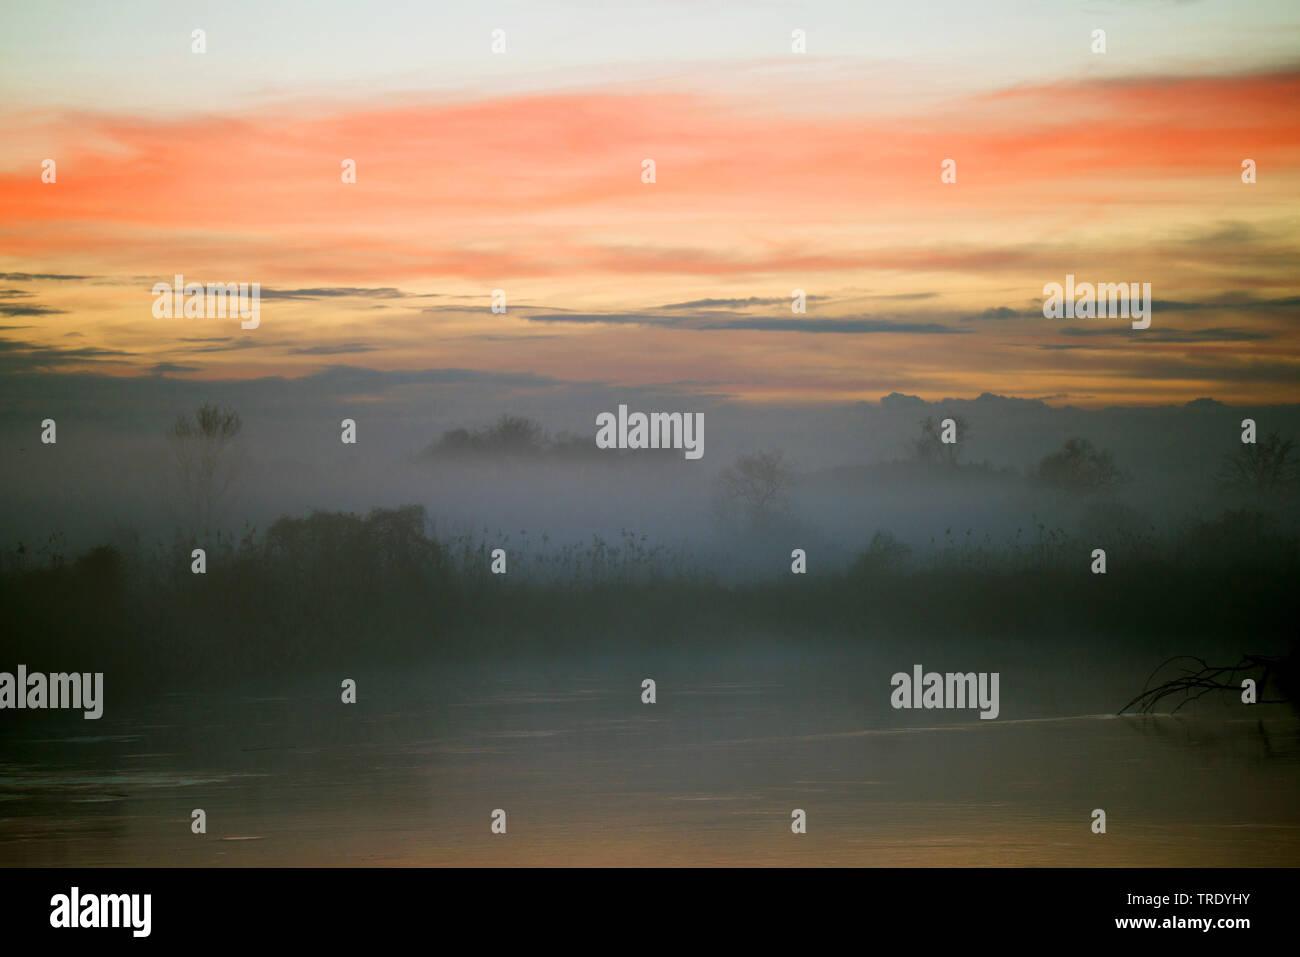 mist damps over floodplains of the Amper in evening light, Germany, Bavaria Stock Photo